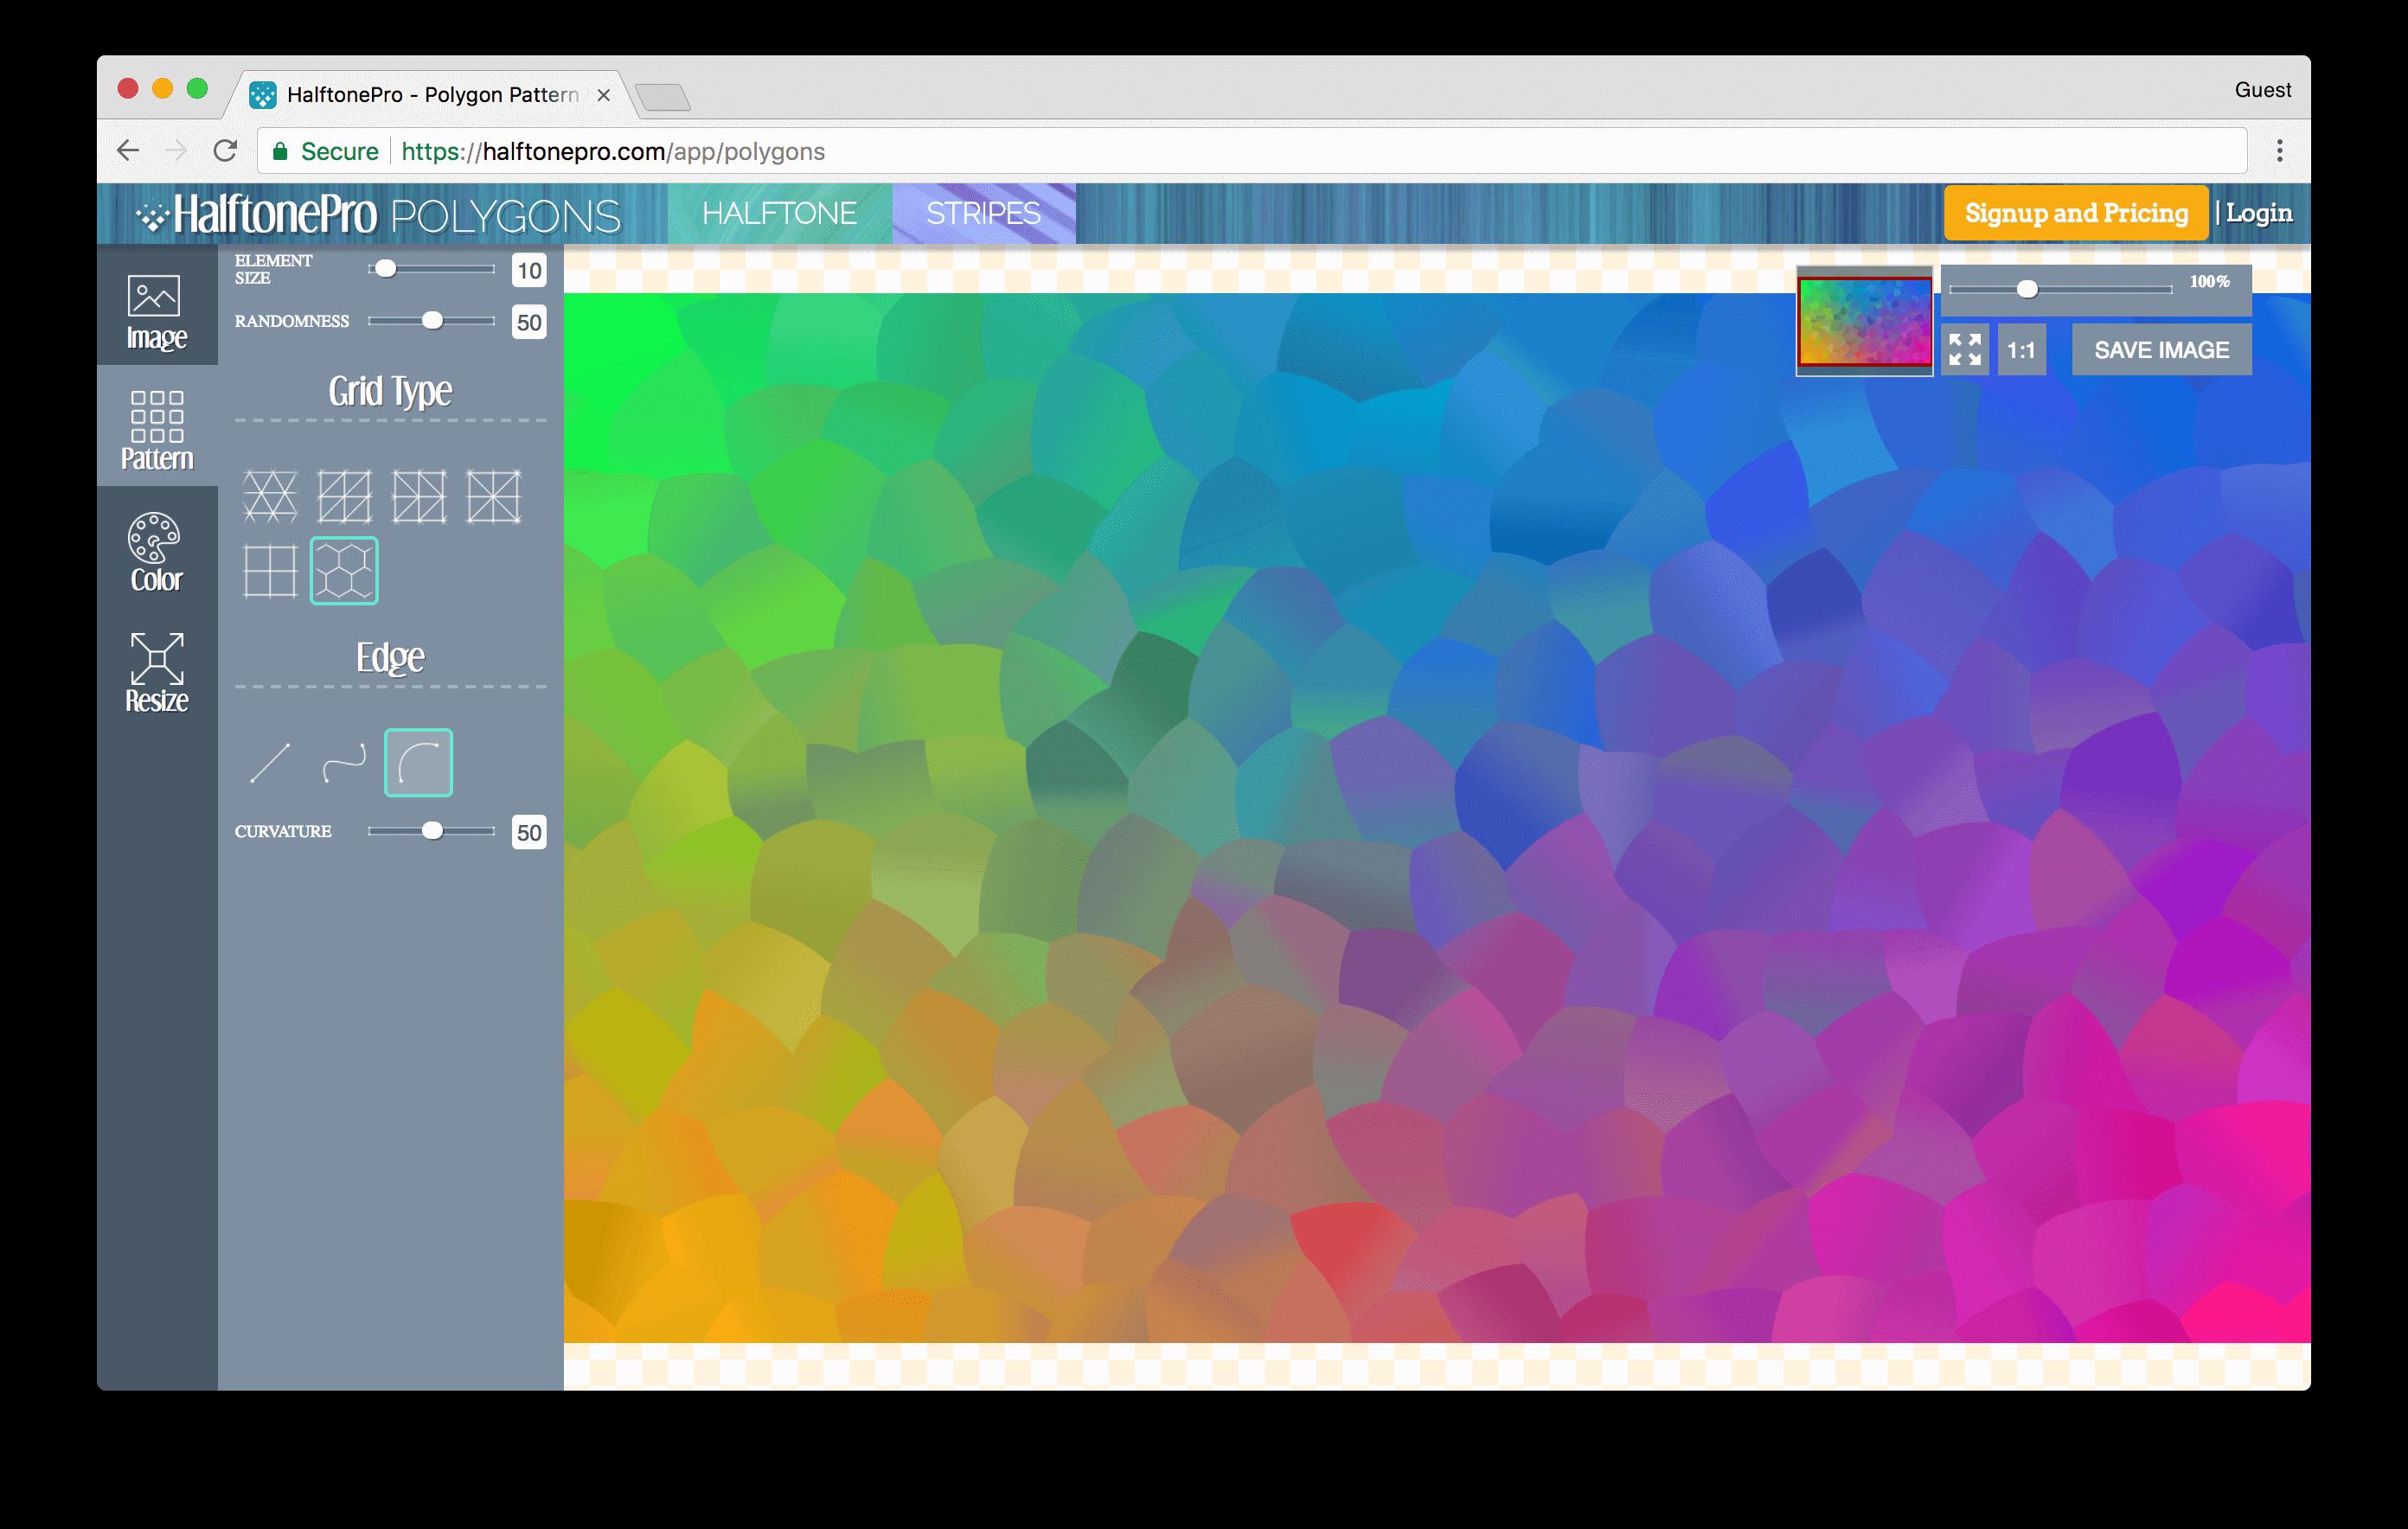 halftonepro.com/app/polygons